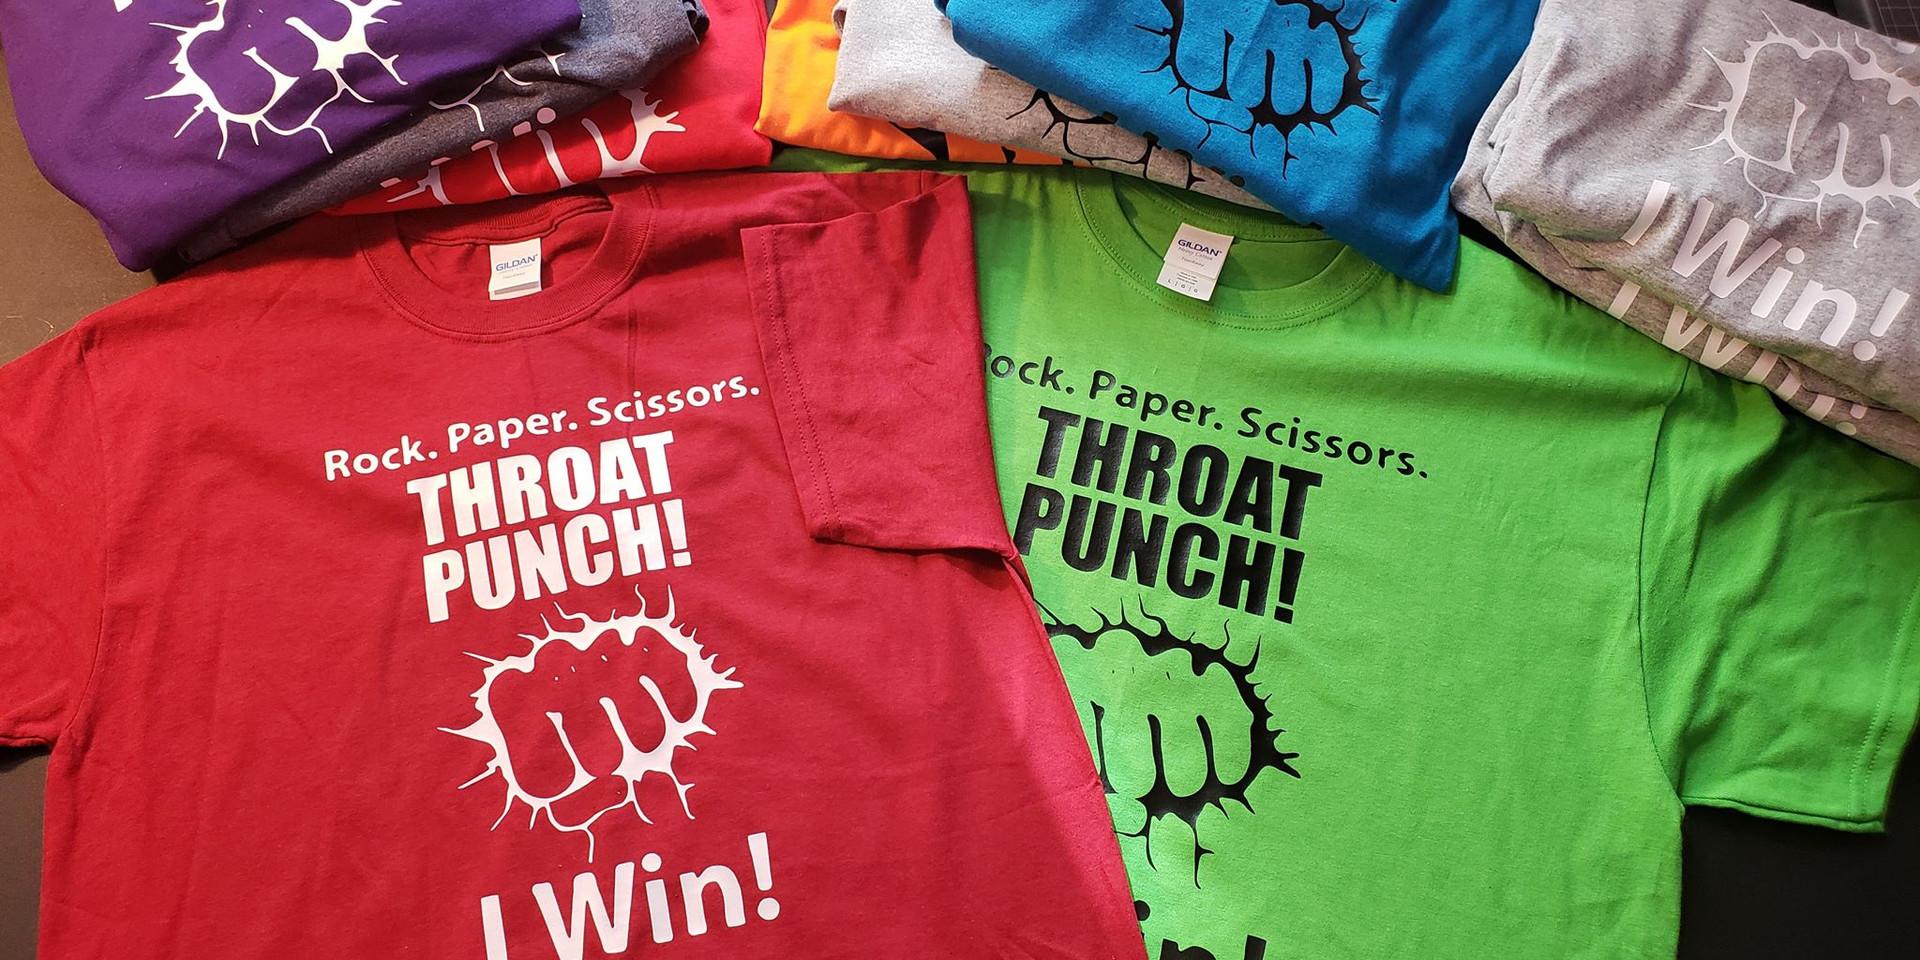 thorat punch.jpg